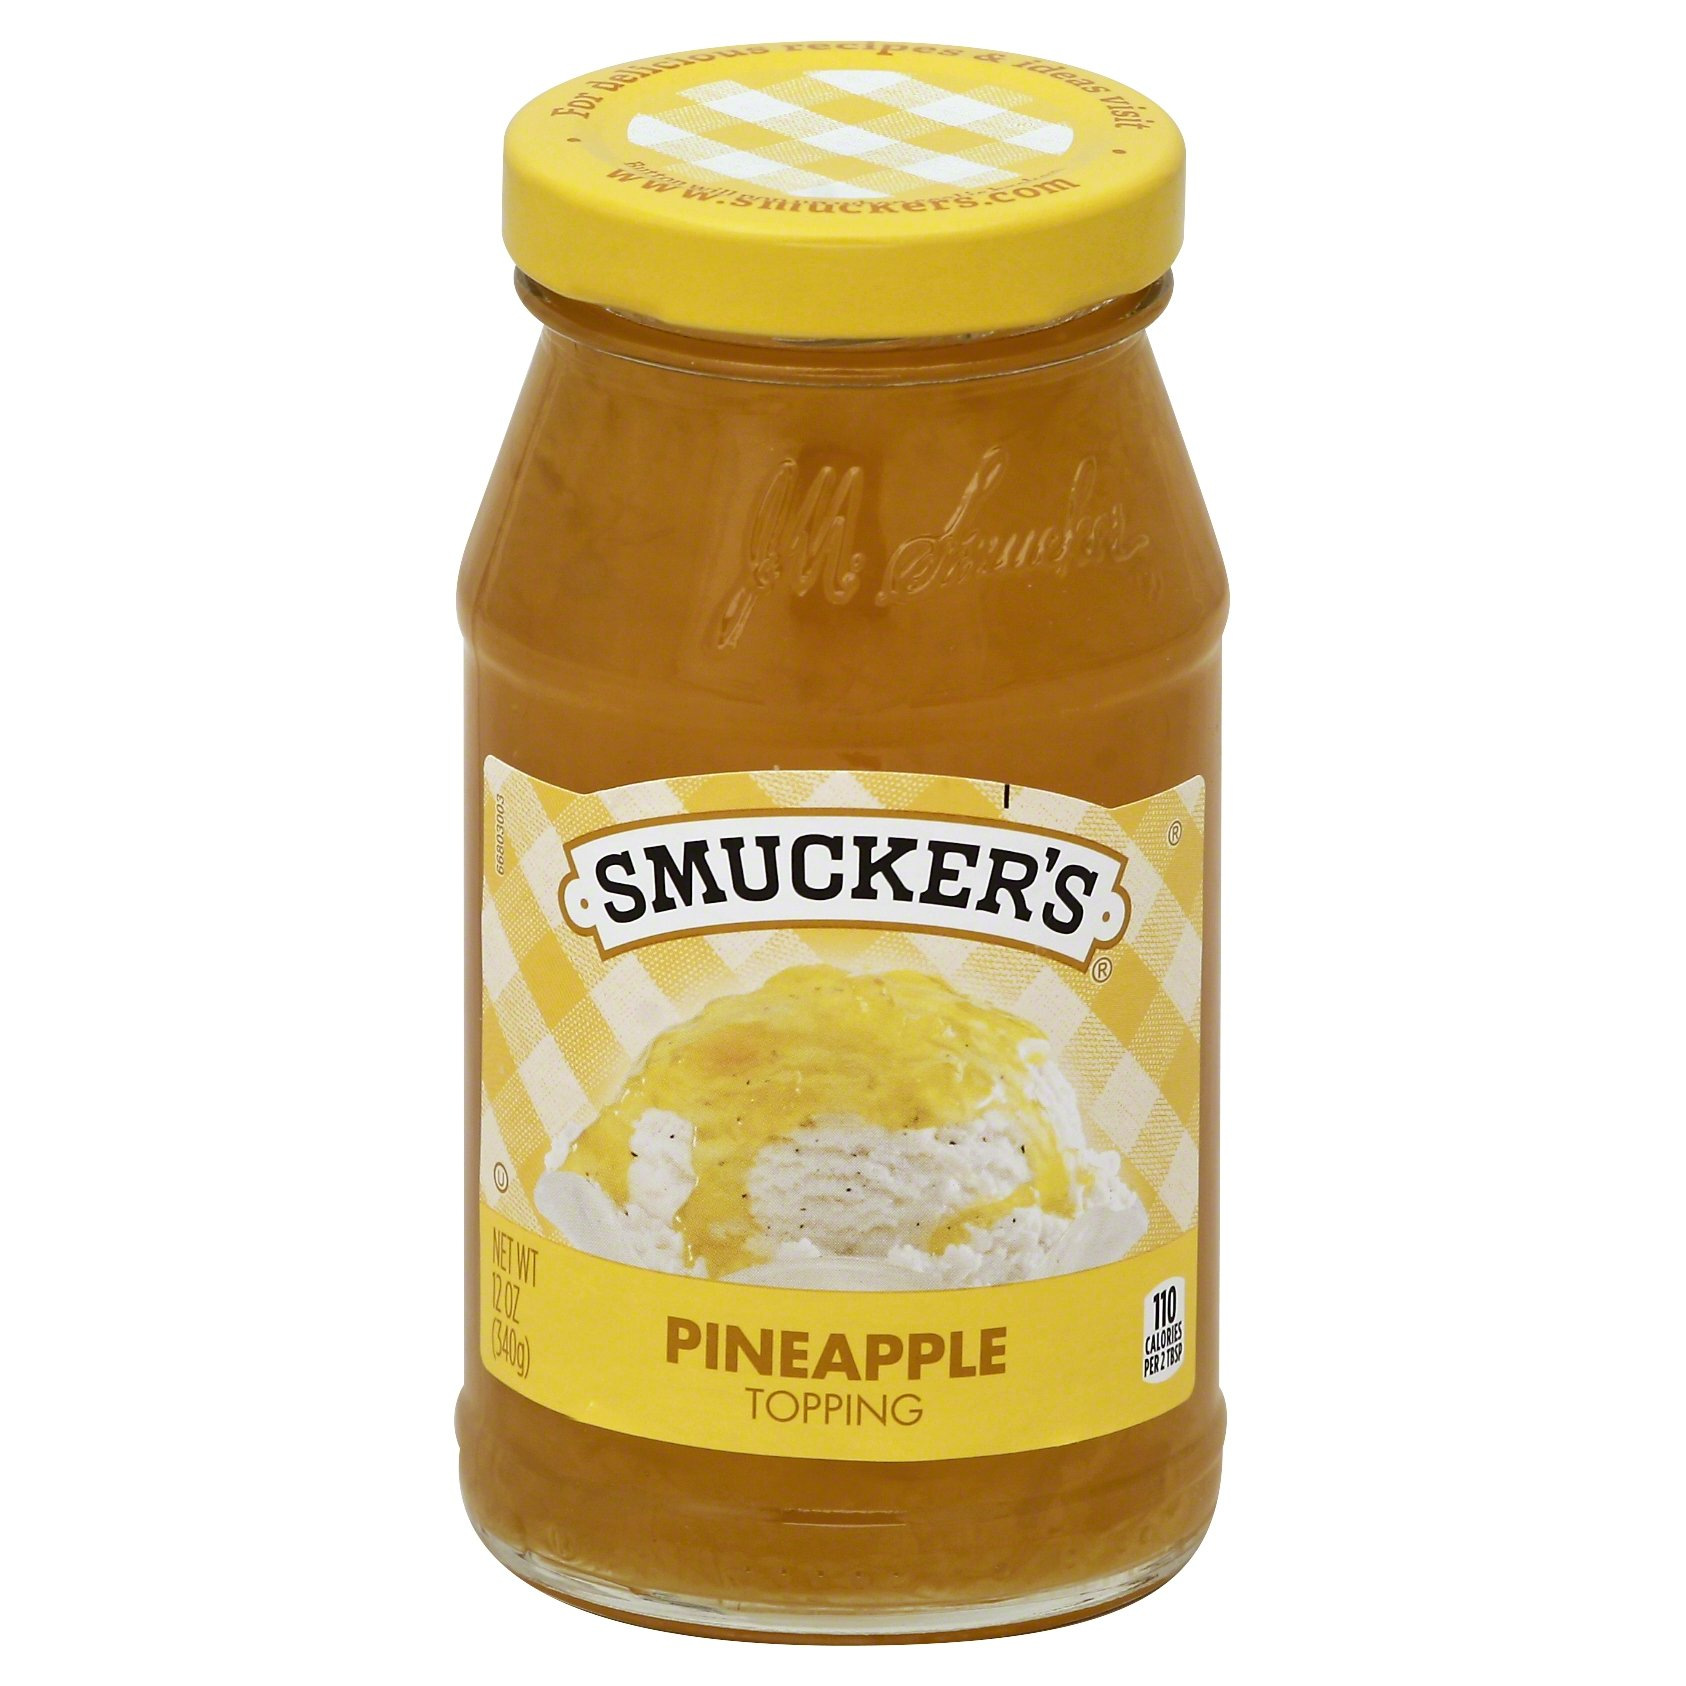 Smucker's Pineapple Spoonable Ice Cream Topping, 12 oz